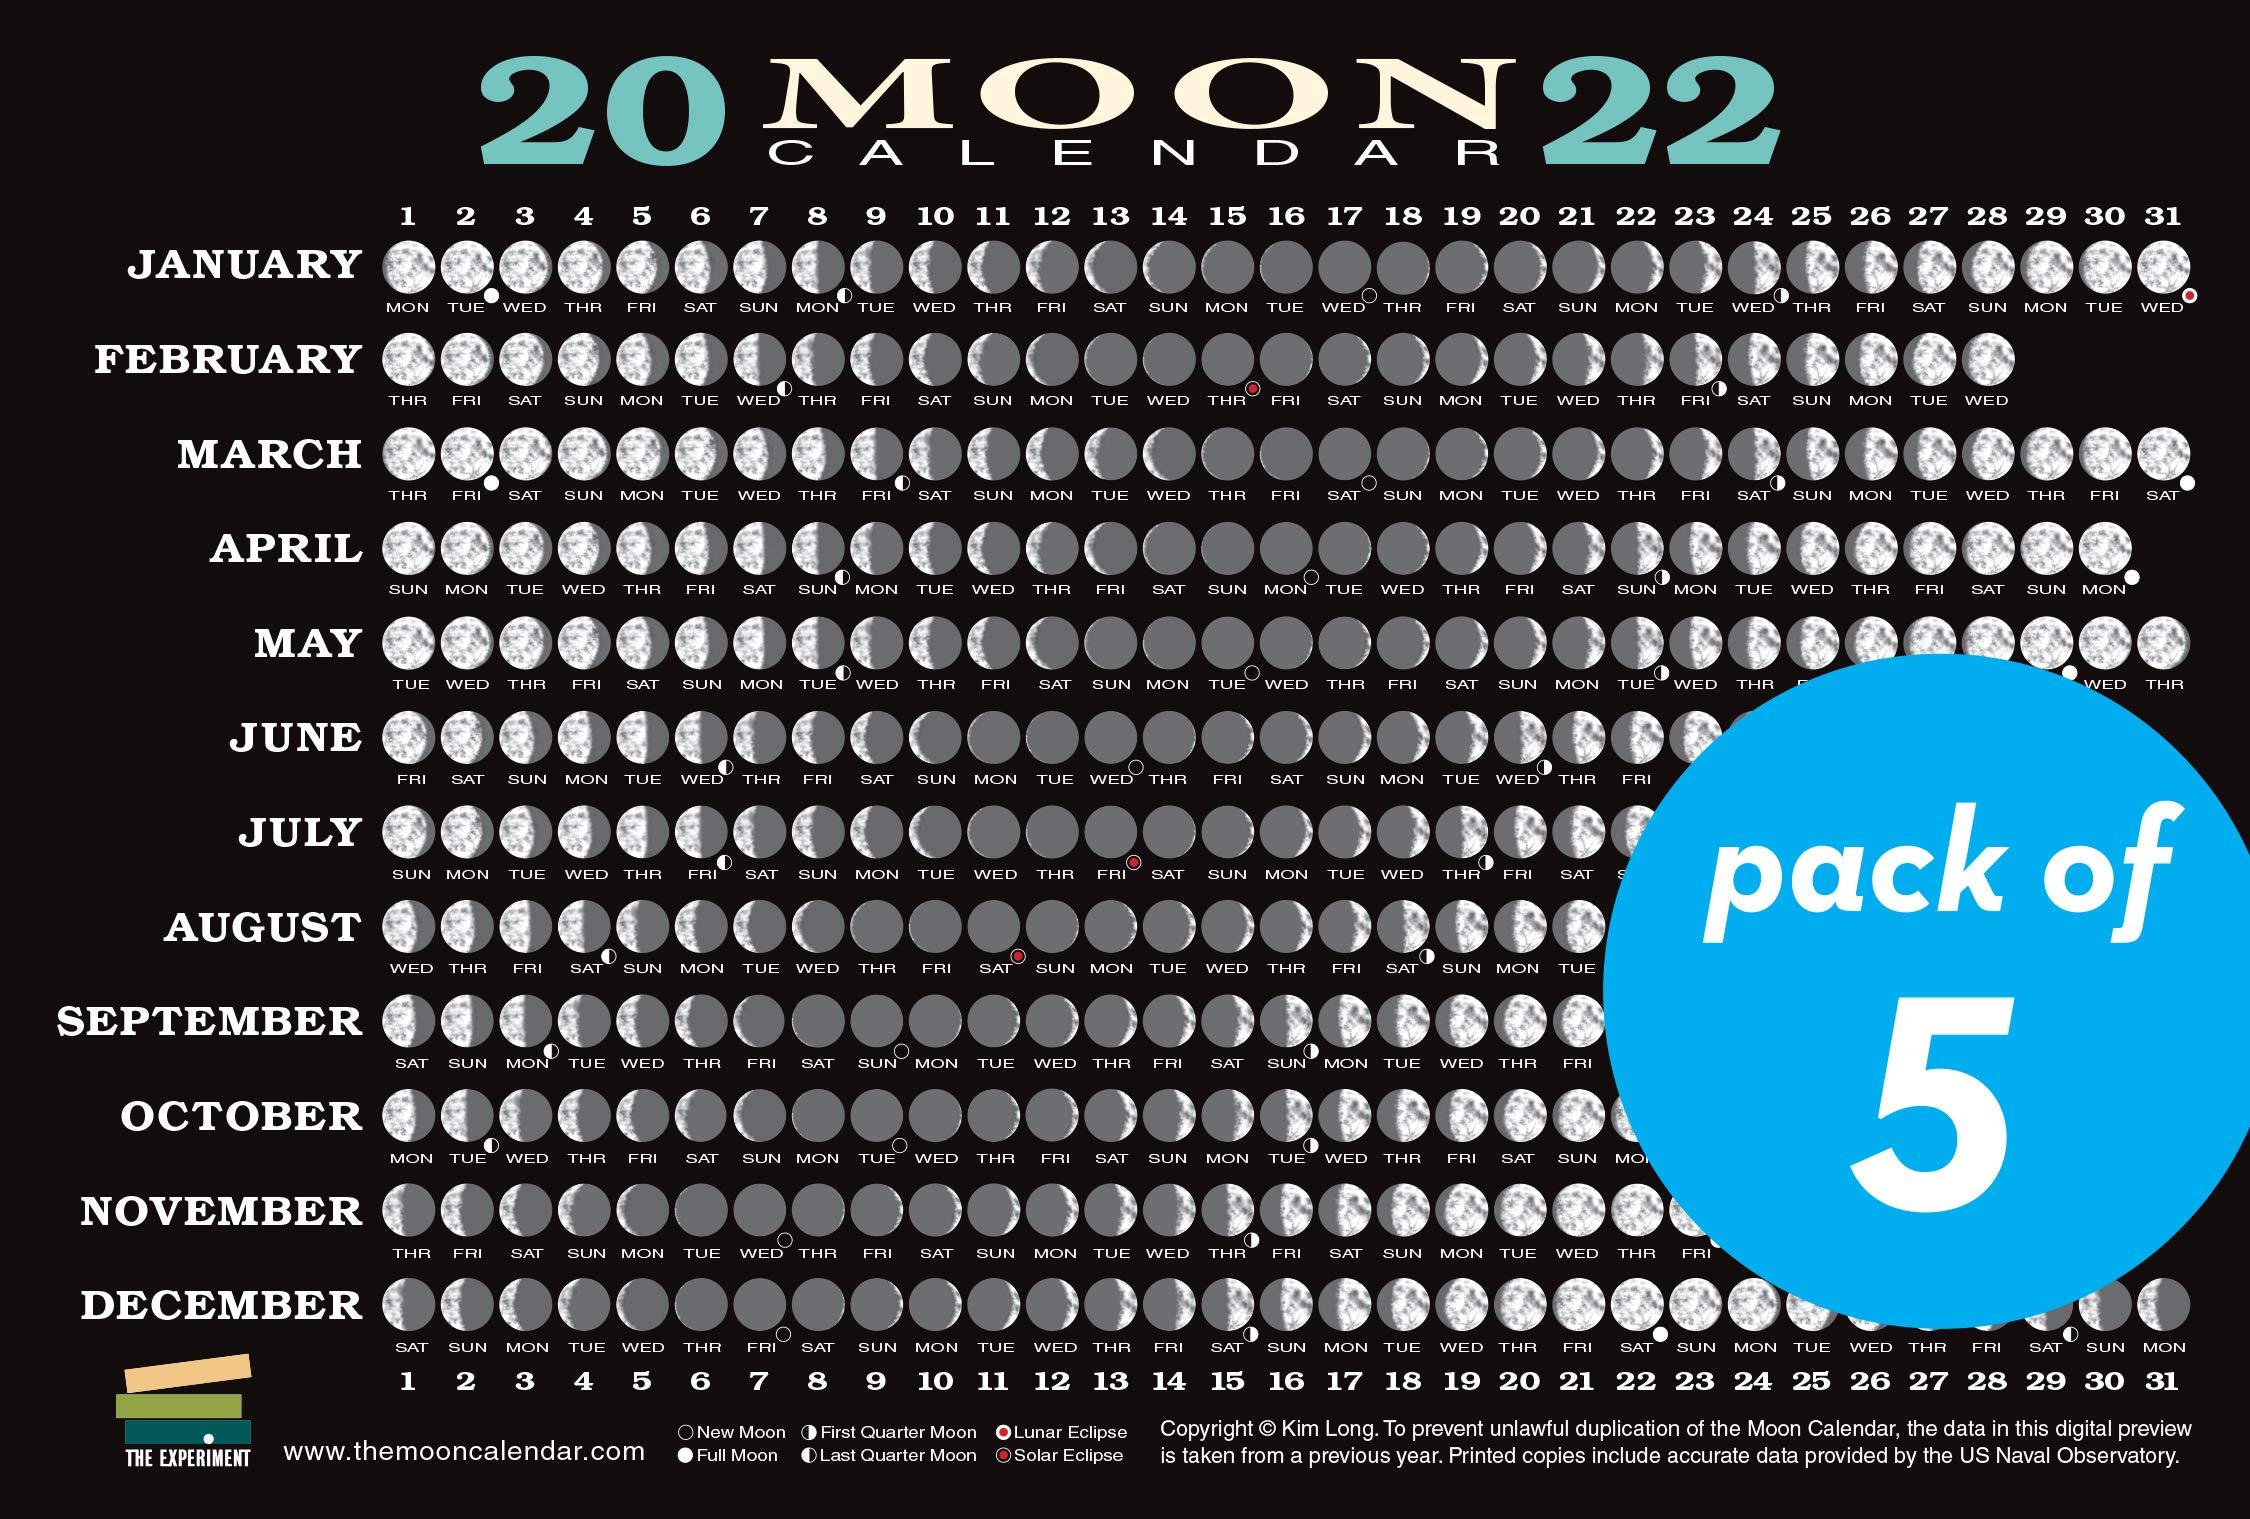 Moon Calendar February 2022.2022 Moon Calendar Card 5 Pack Lunar Phases Eclipses And More Long Kim 9781615197842 Amazon Com Books